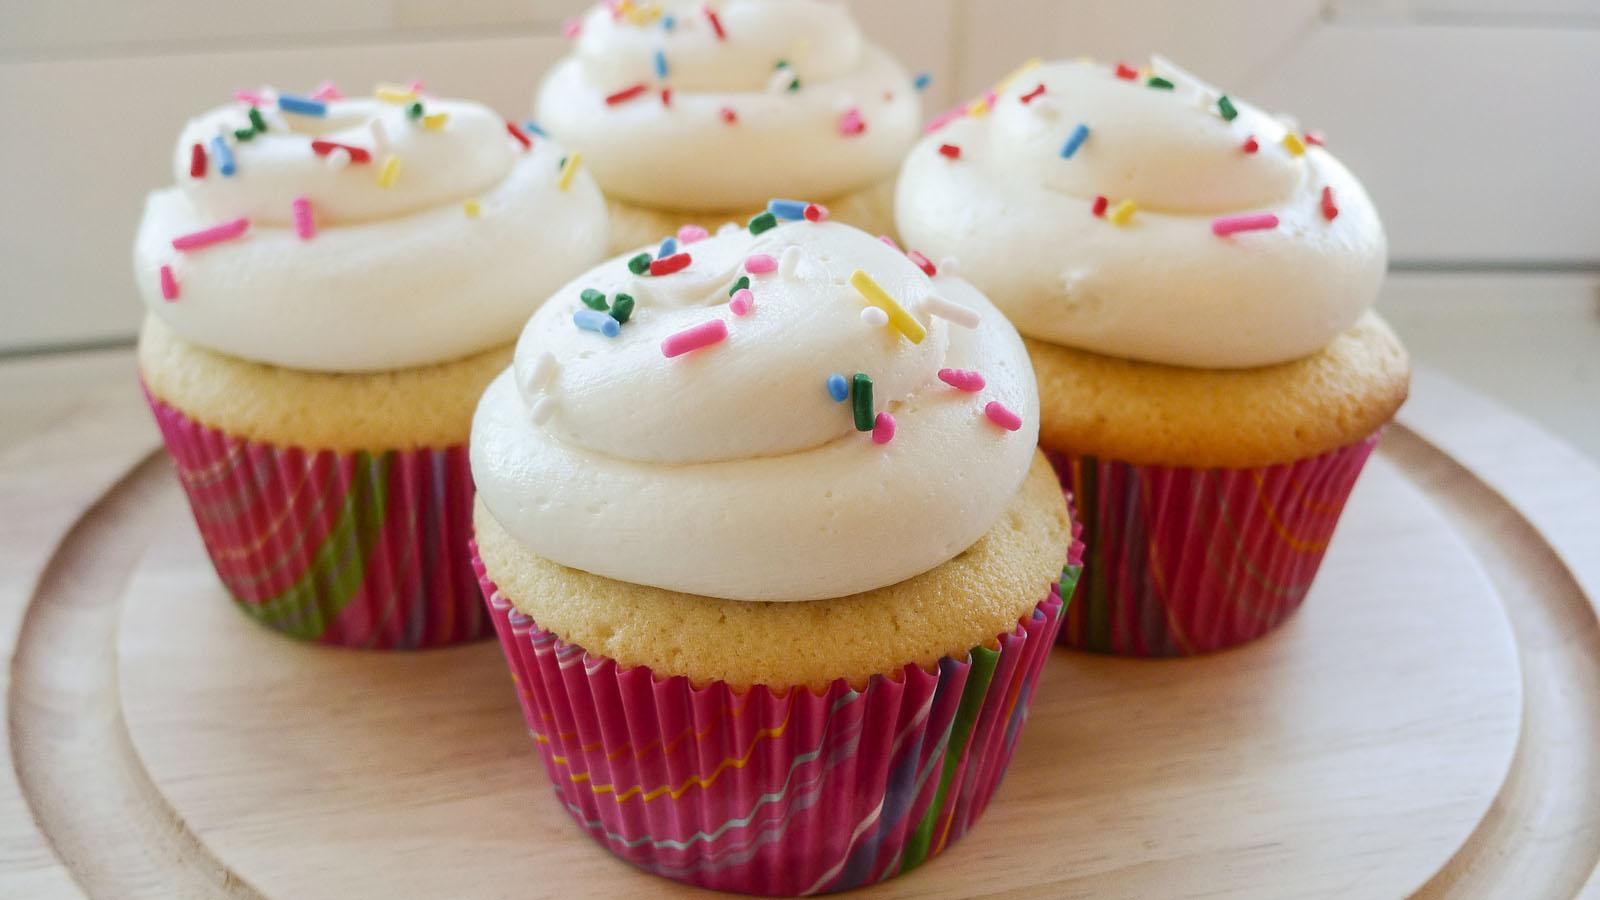 http://img2.wikia.nocookie.net/__cb20130629134848/yummy-cupcakes/images/7/7b/Vanilla_cupcakes.jpg